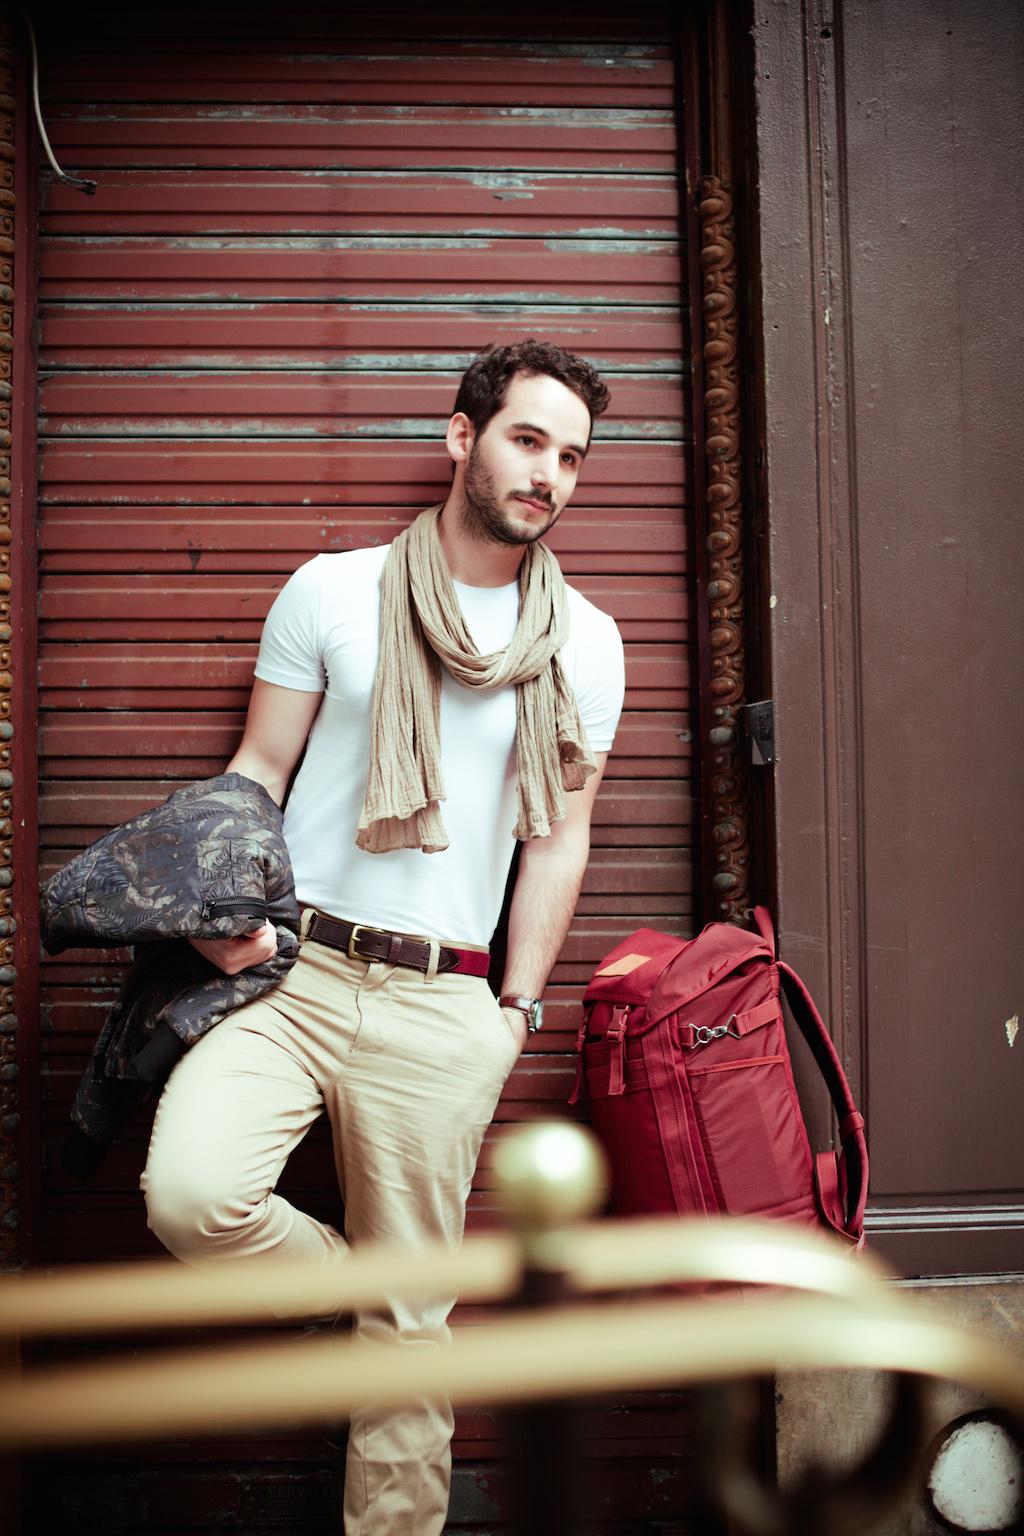 blog-mode-homme-izac-eastpak-ursul-oxygen-faguo-bunker-5